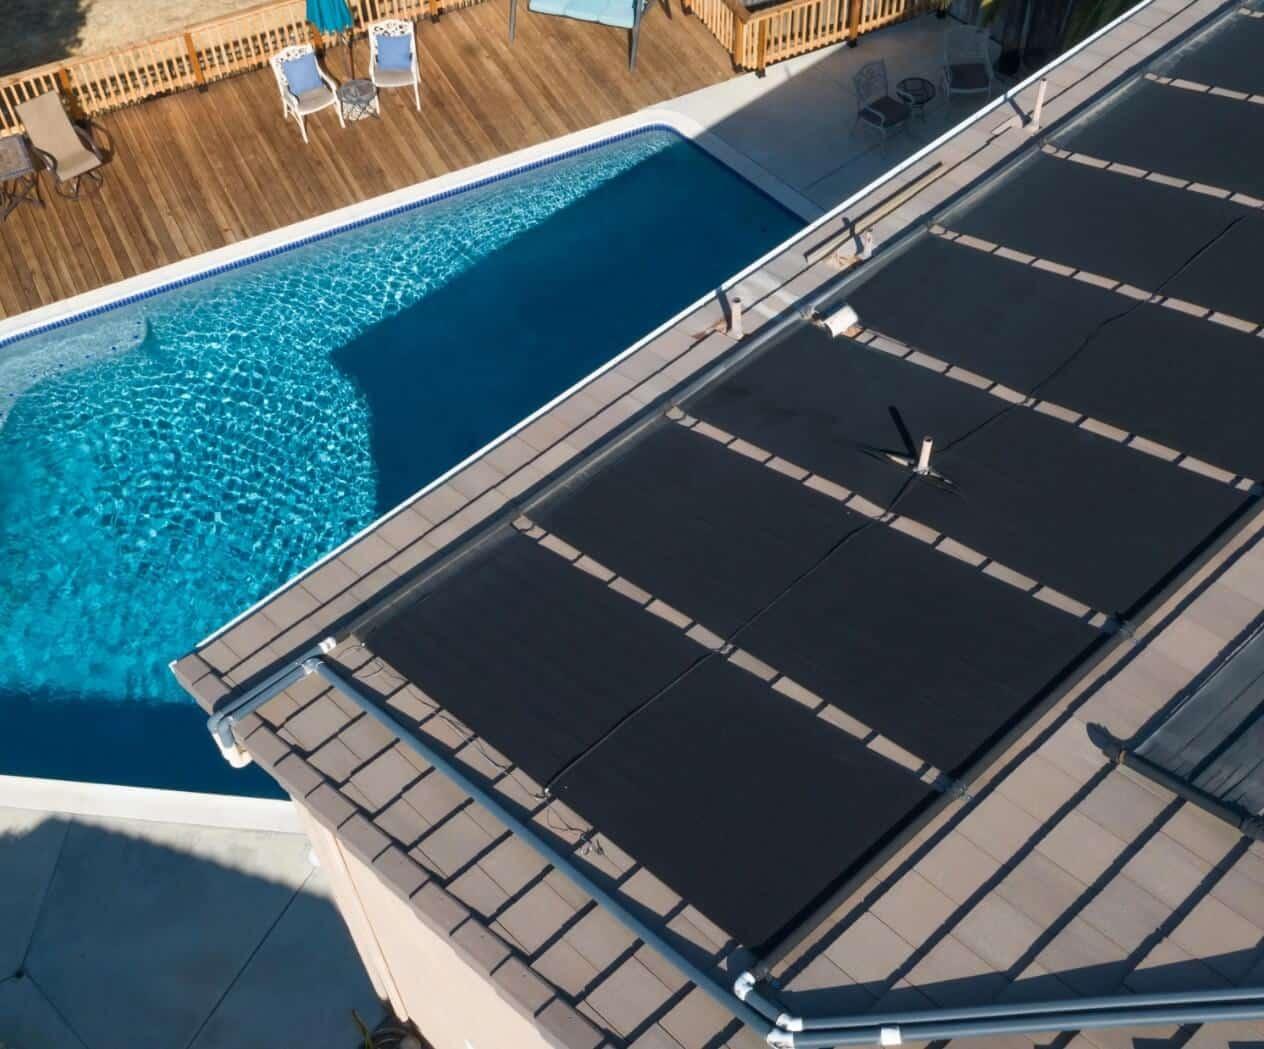 paneles solares para calentar piscinas